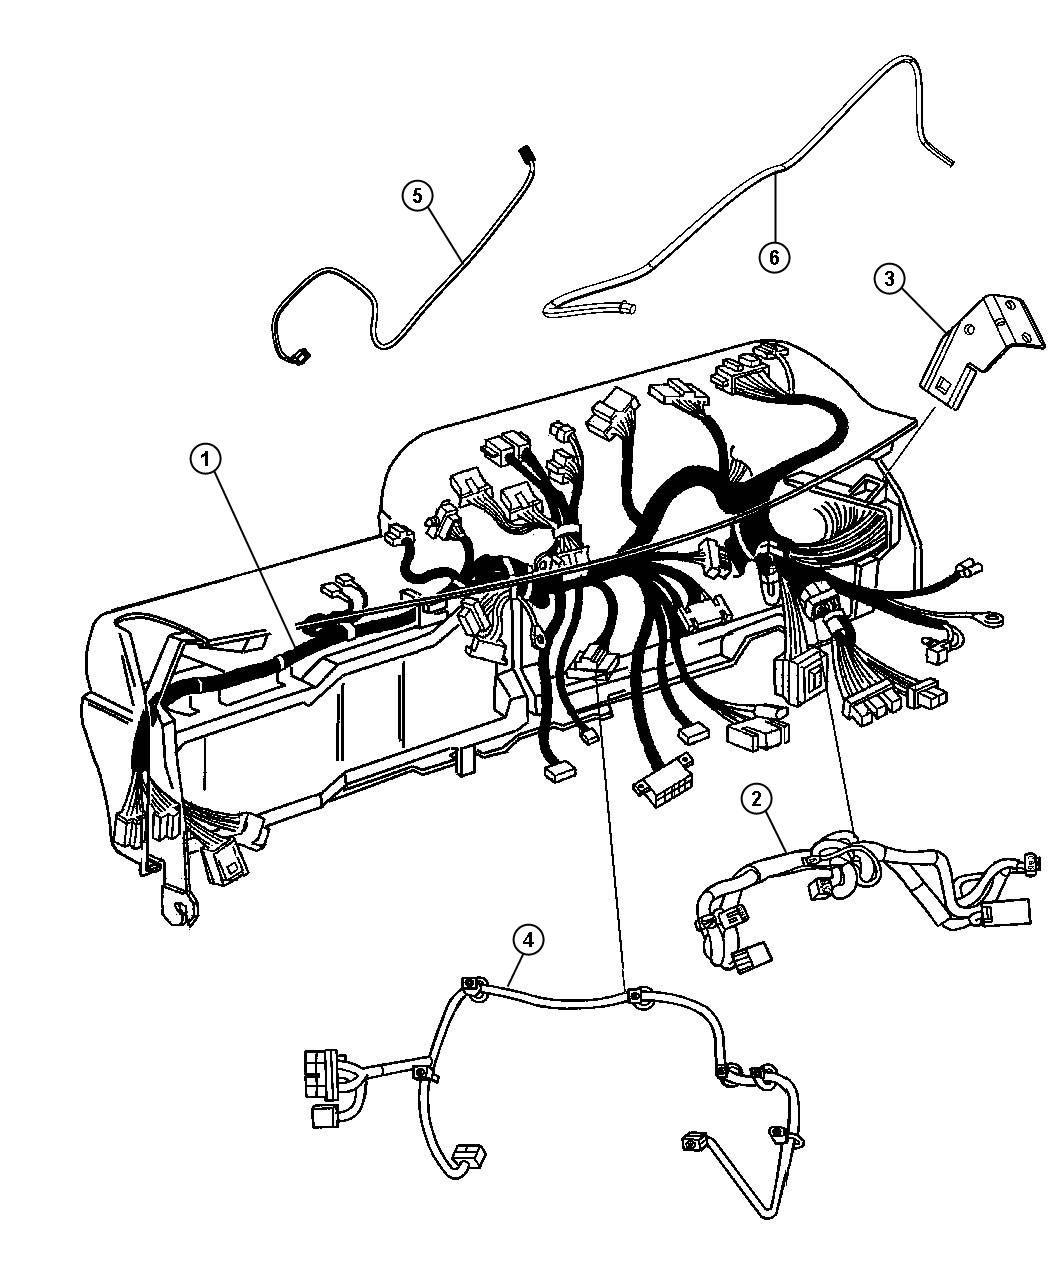 Dodge Ram Wiring Jumper Telematics Module